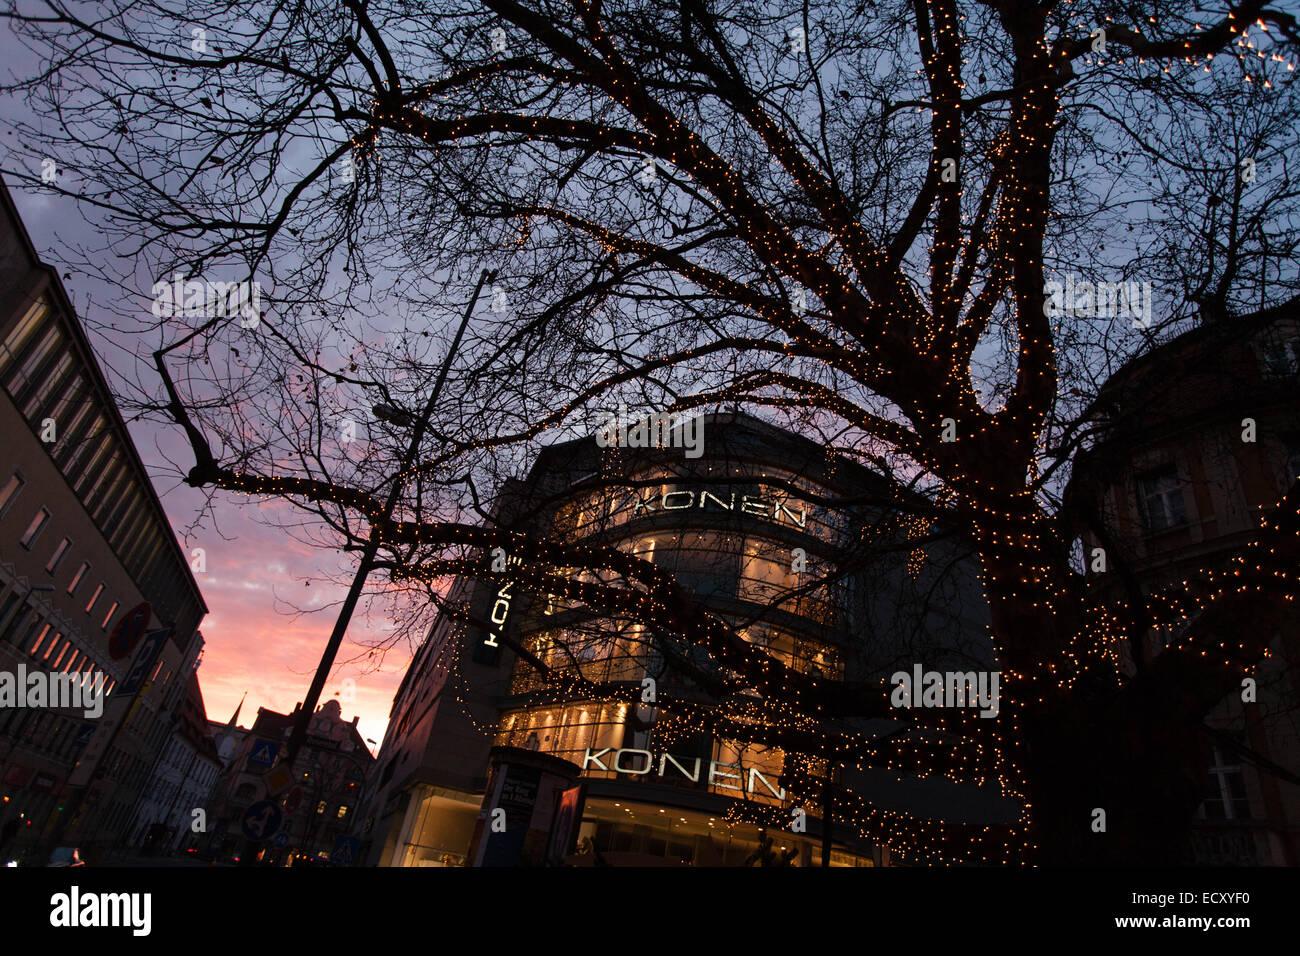 Größter Tannenbaum Deutschlands.Größter Weihnachtsbaum Deutschlands Stockfotos Größter